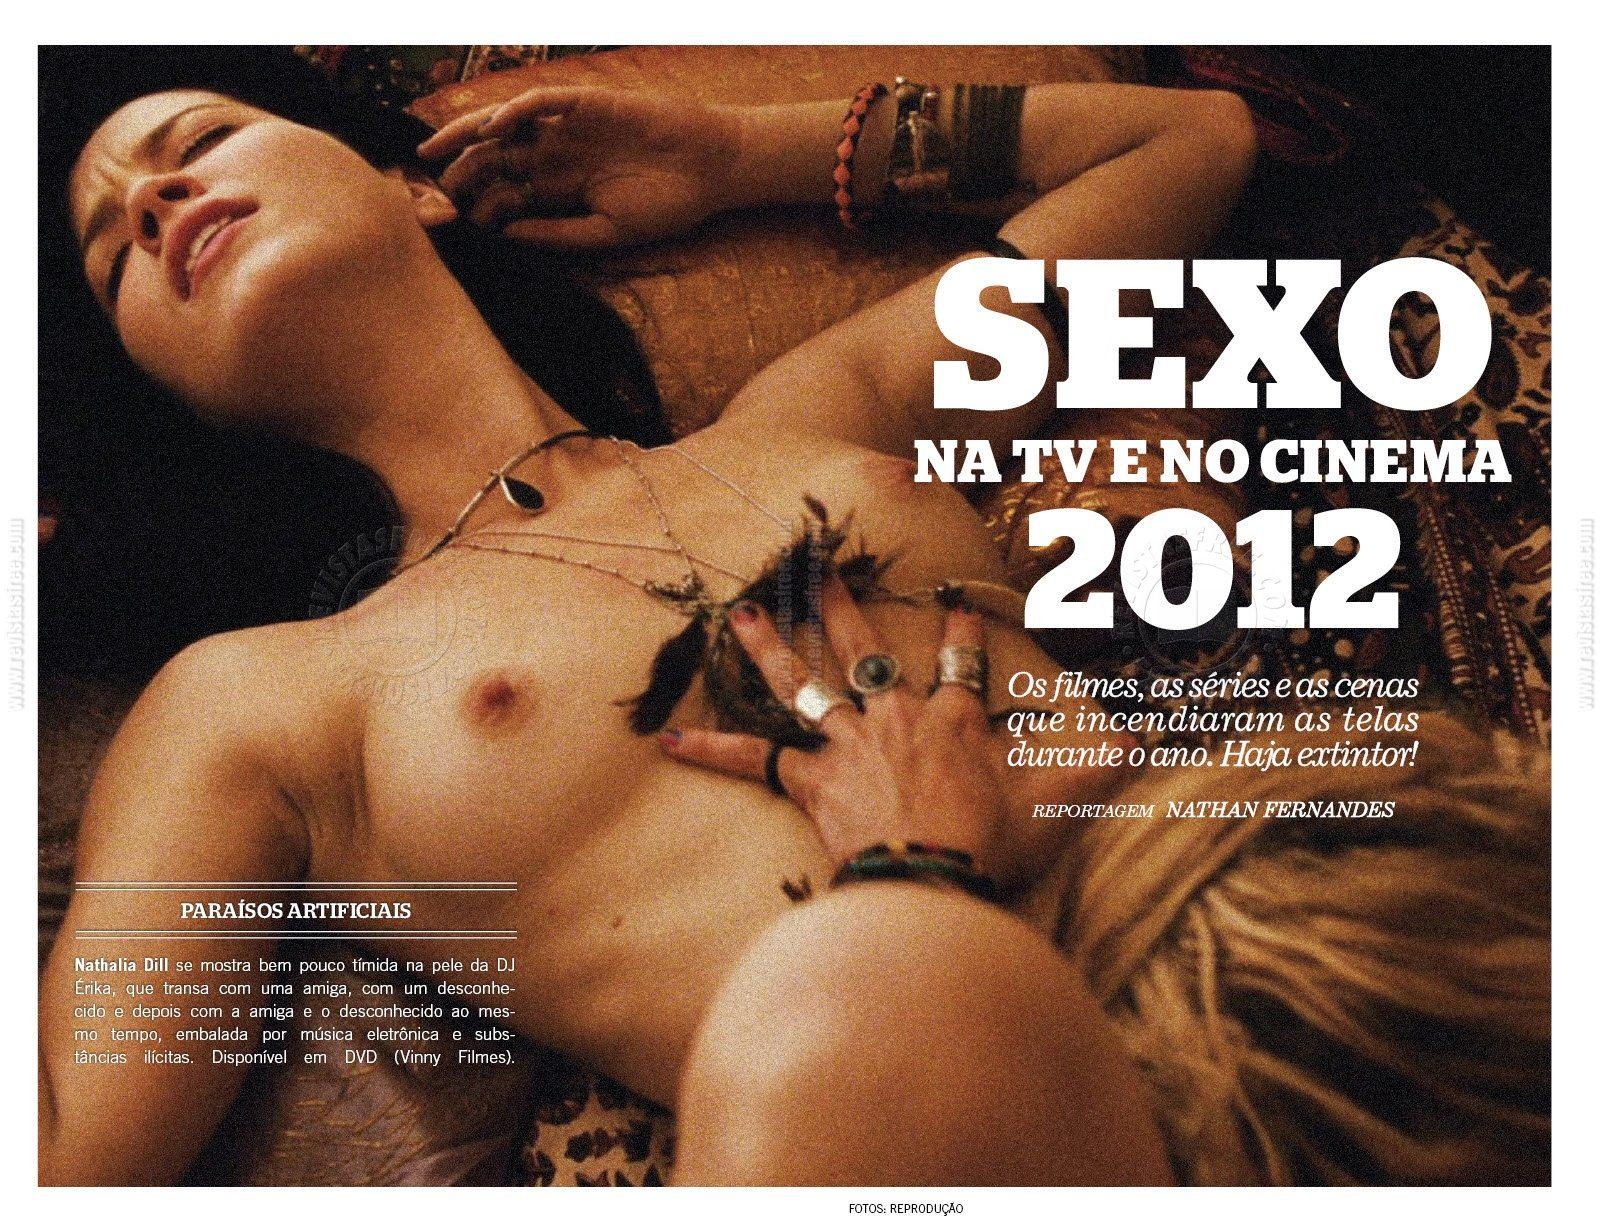 Dill Nua No Filme Para So Artificiais Confira Nath Lia